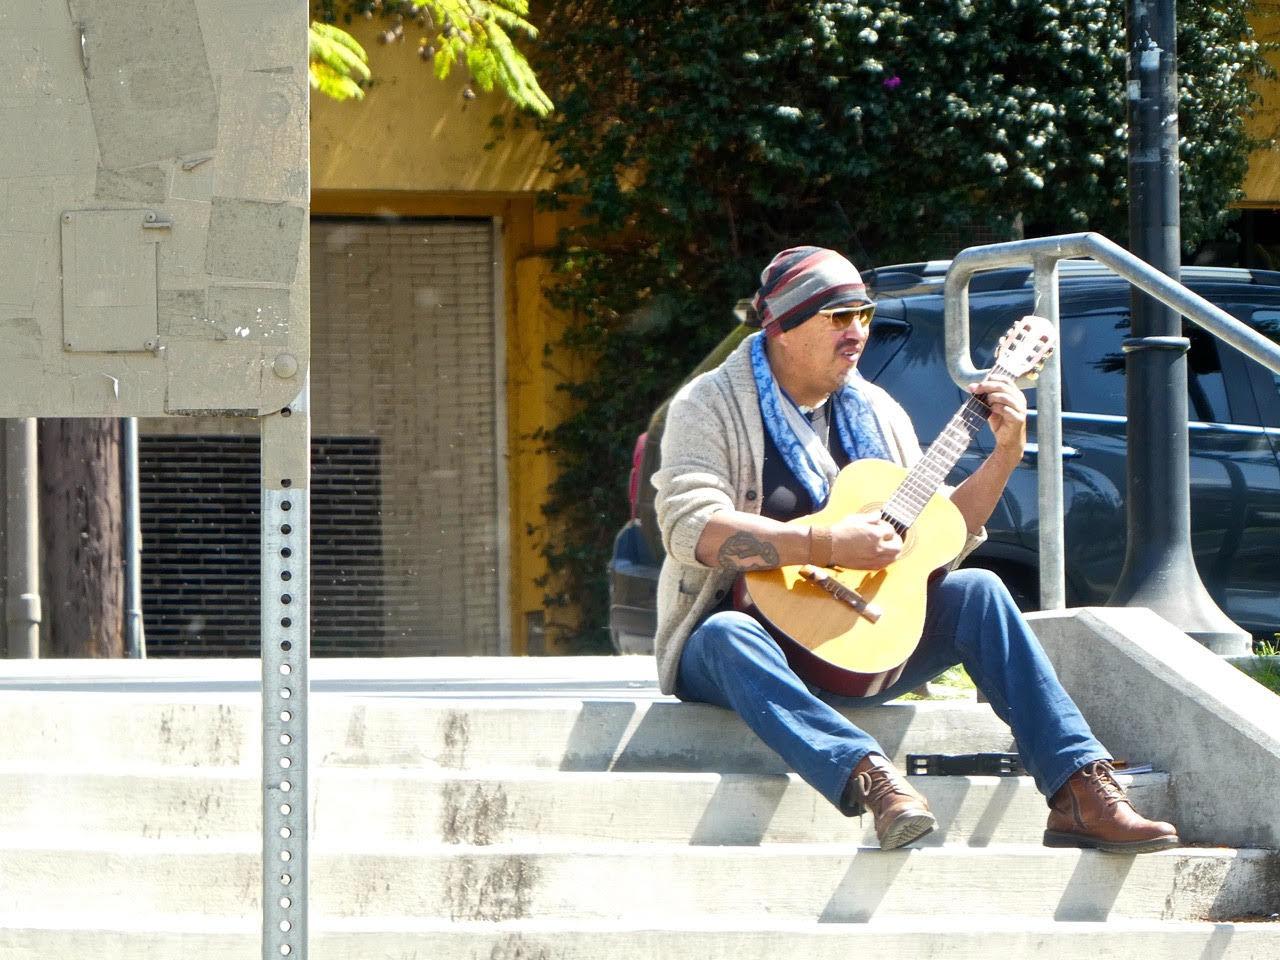 guitarist echo park lake.jpg